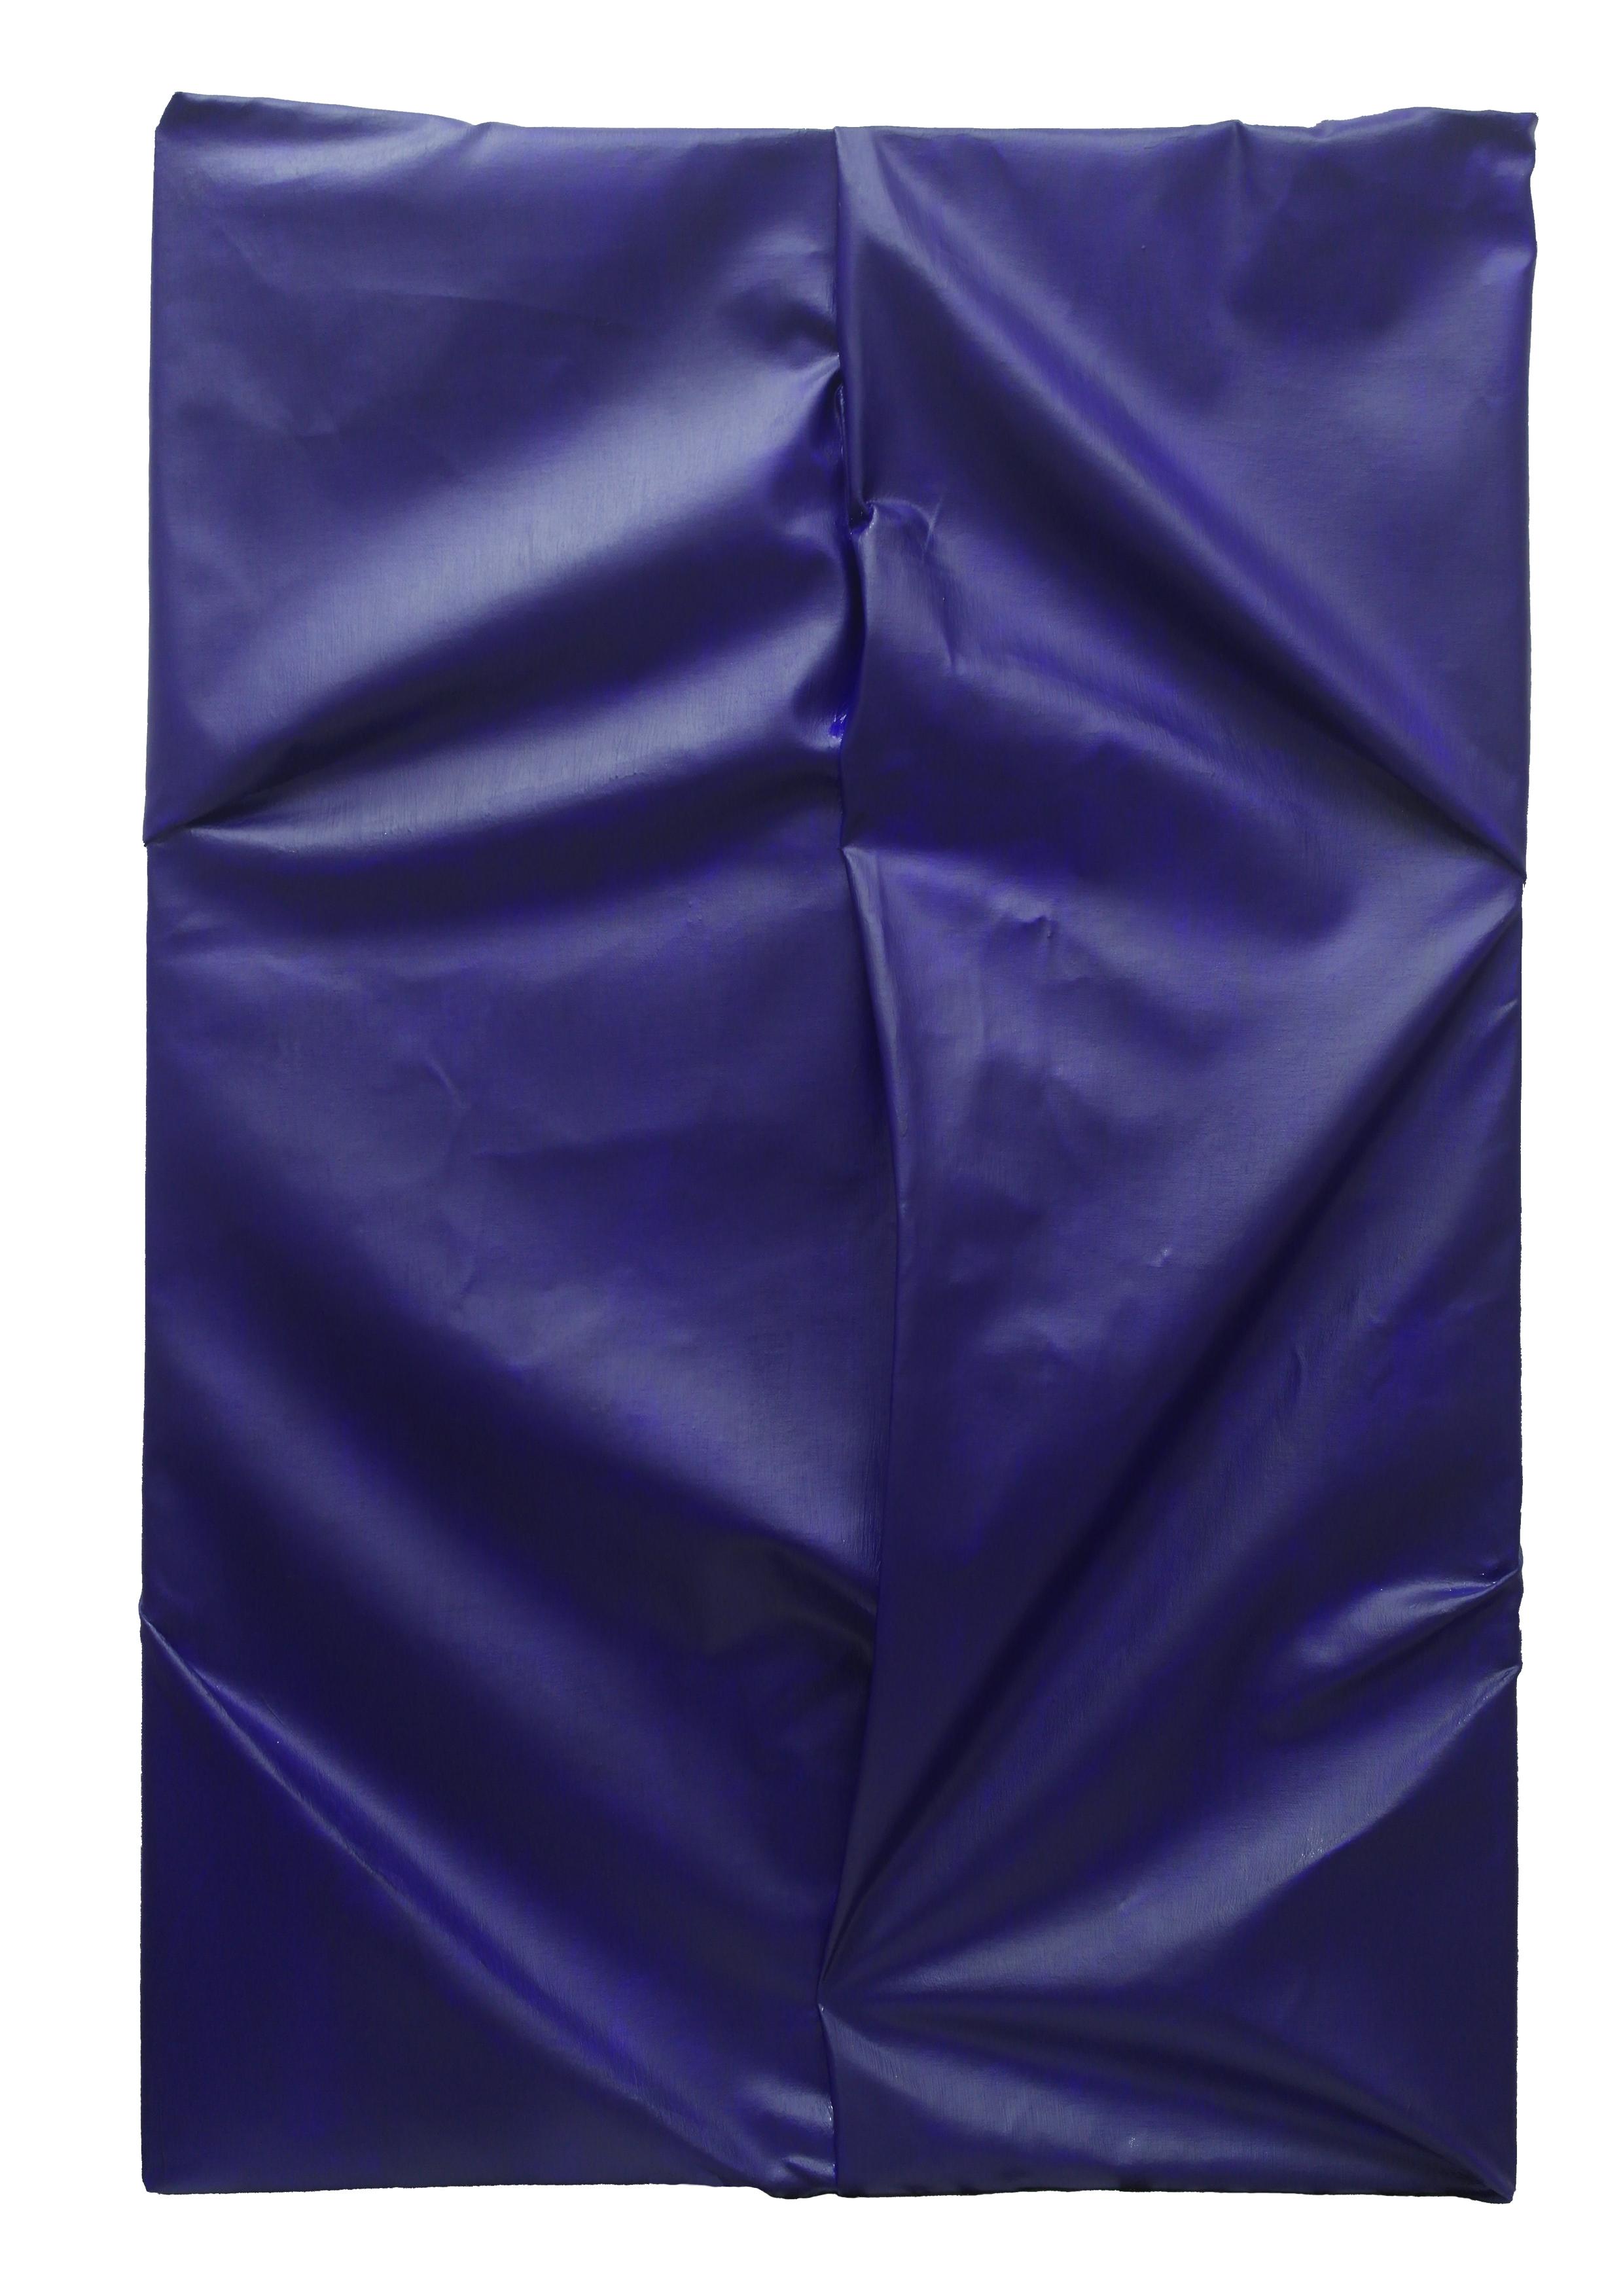 Torso  - 2015  Acrilico su tela piegata  120 x 80 cm